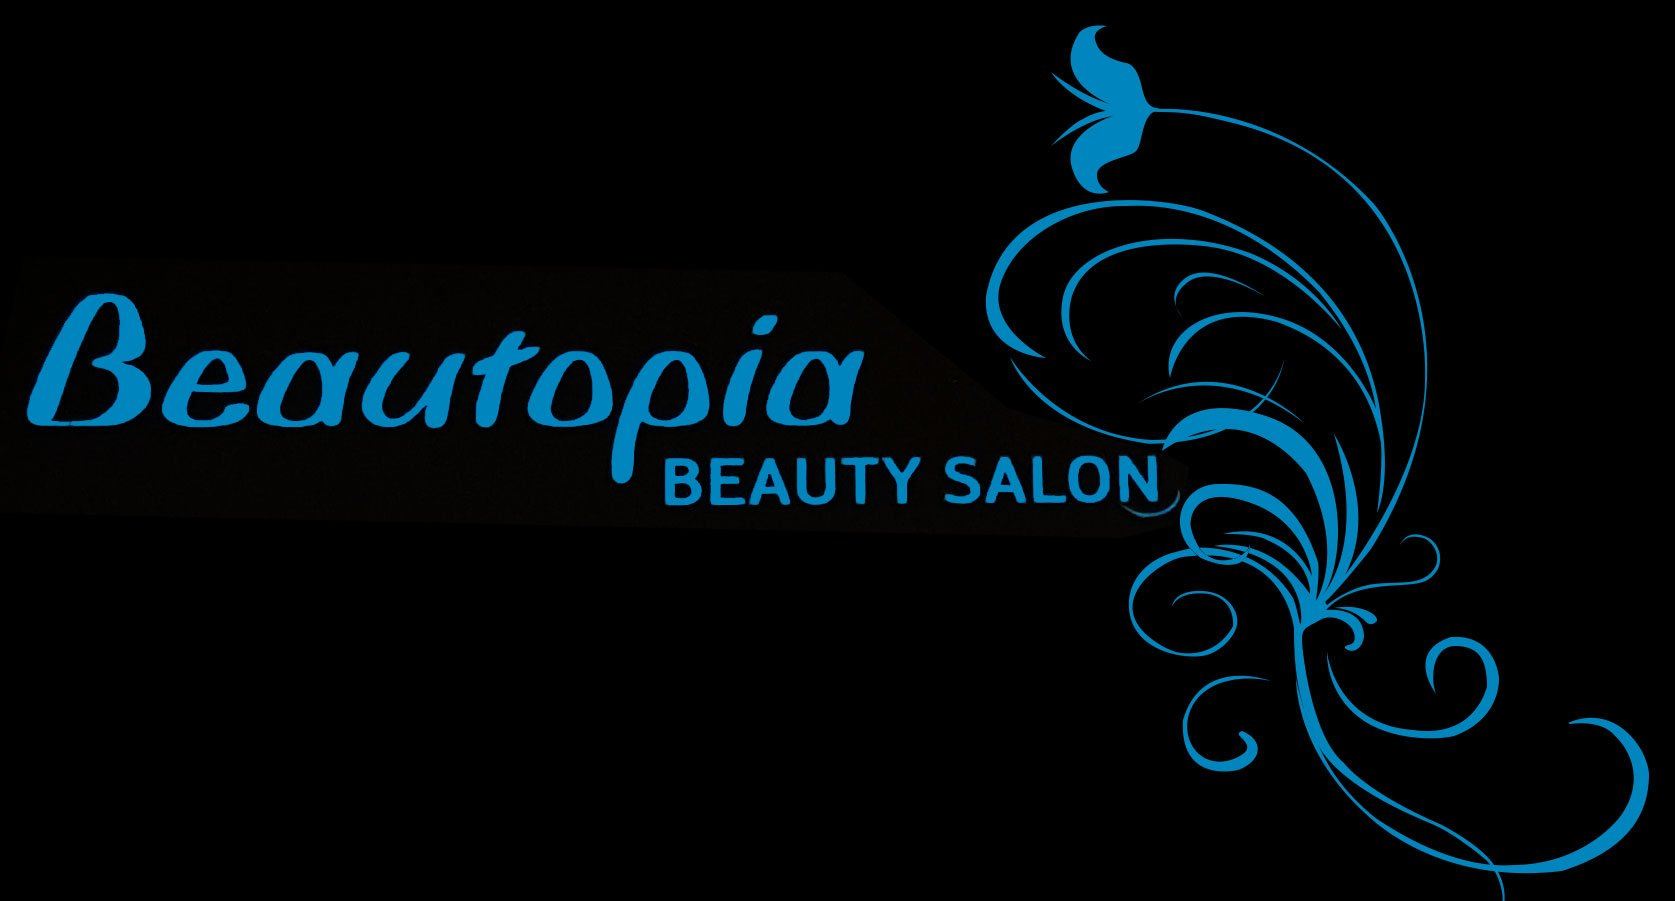 Beautopia beauty salon